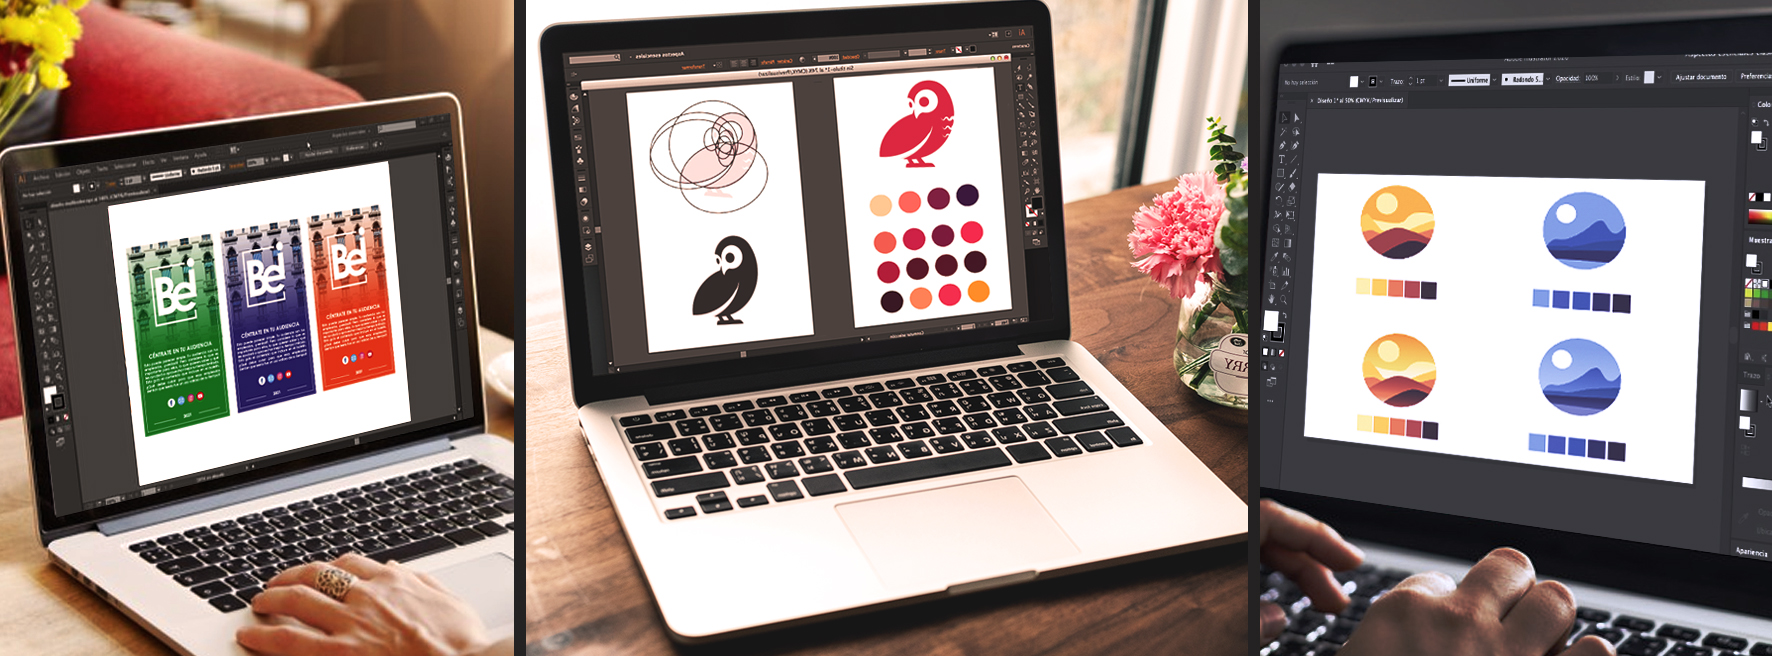 Banner Ilustrador para emprendedores online